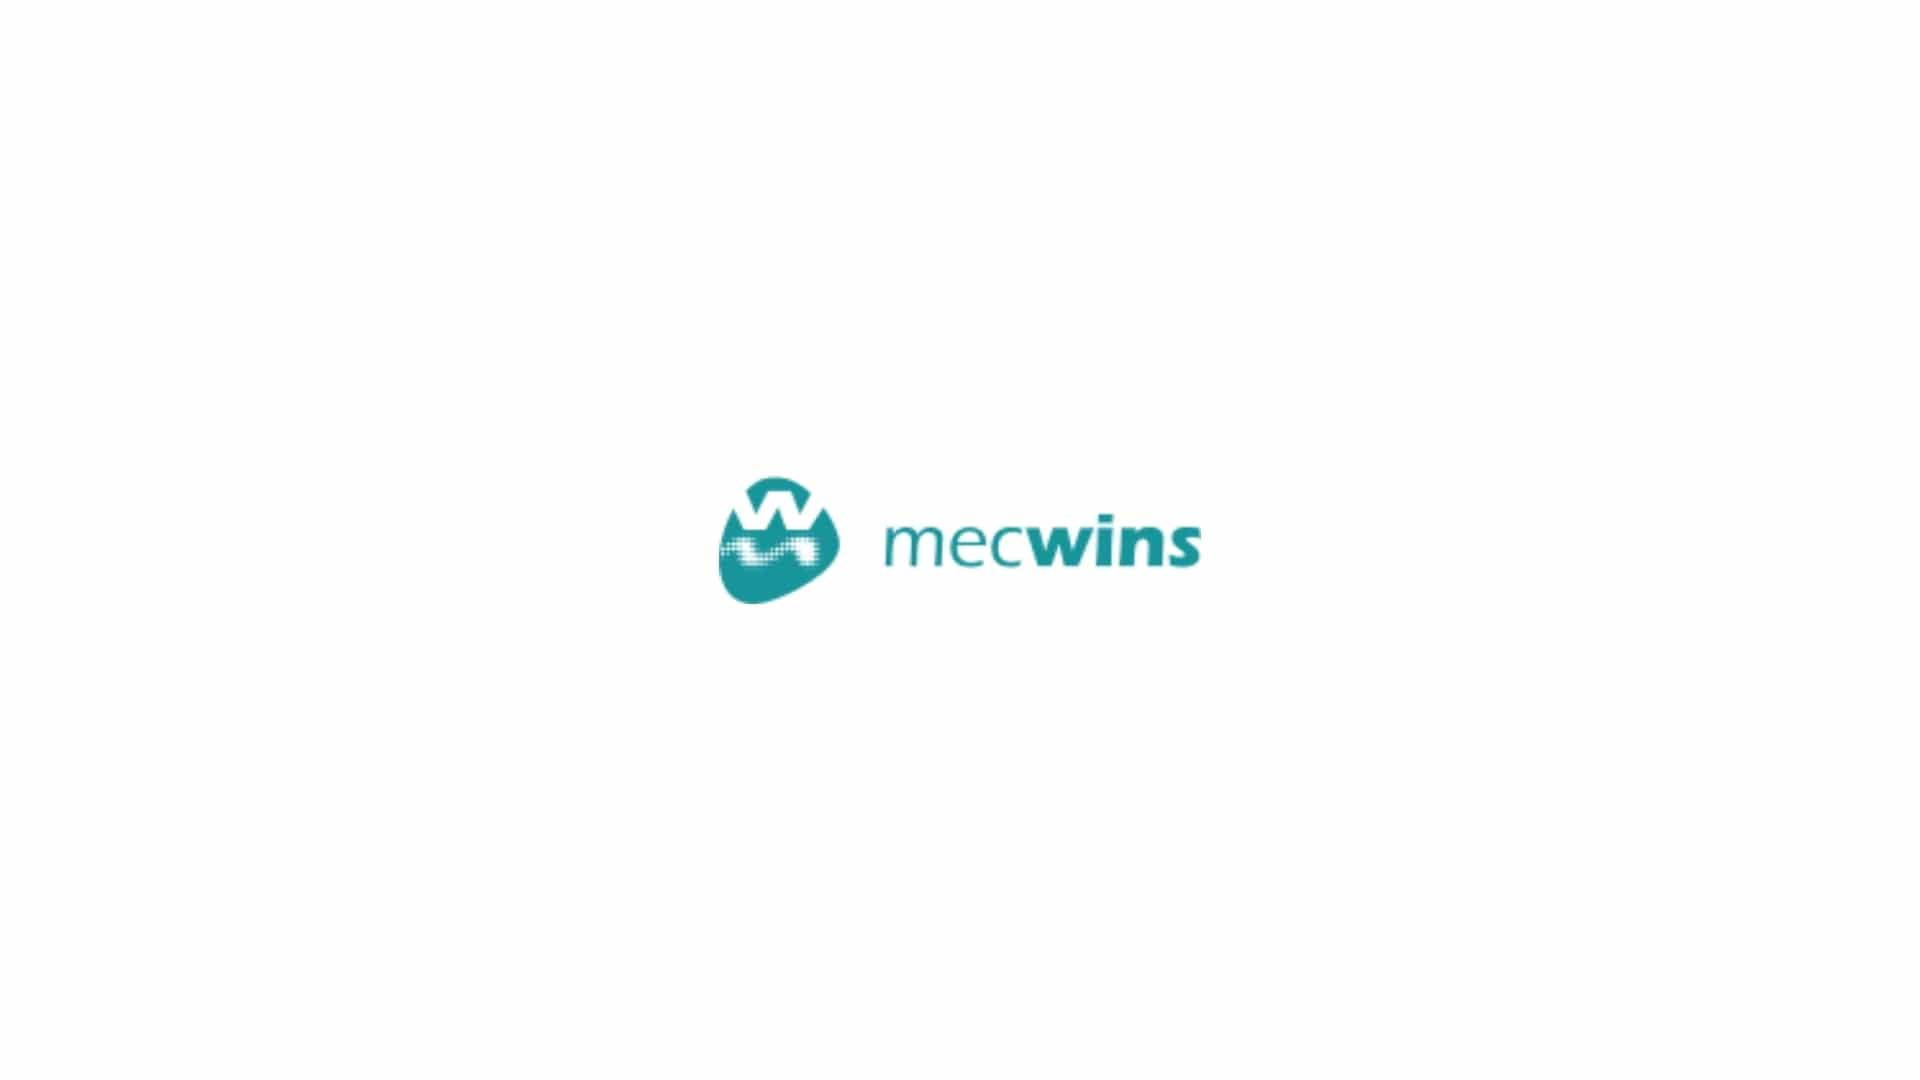 Mecwins Announces Strategic Partnership to Develop POC